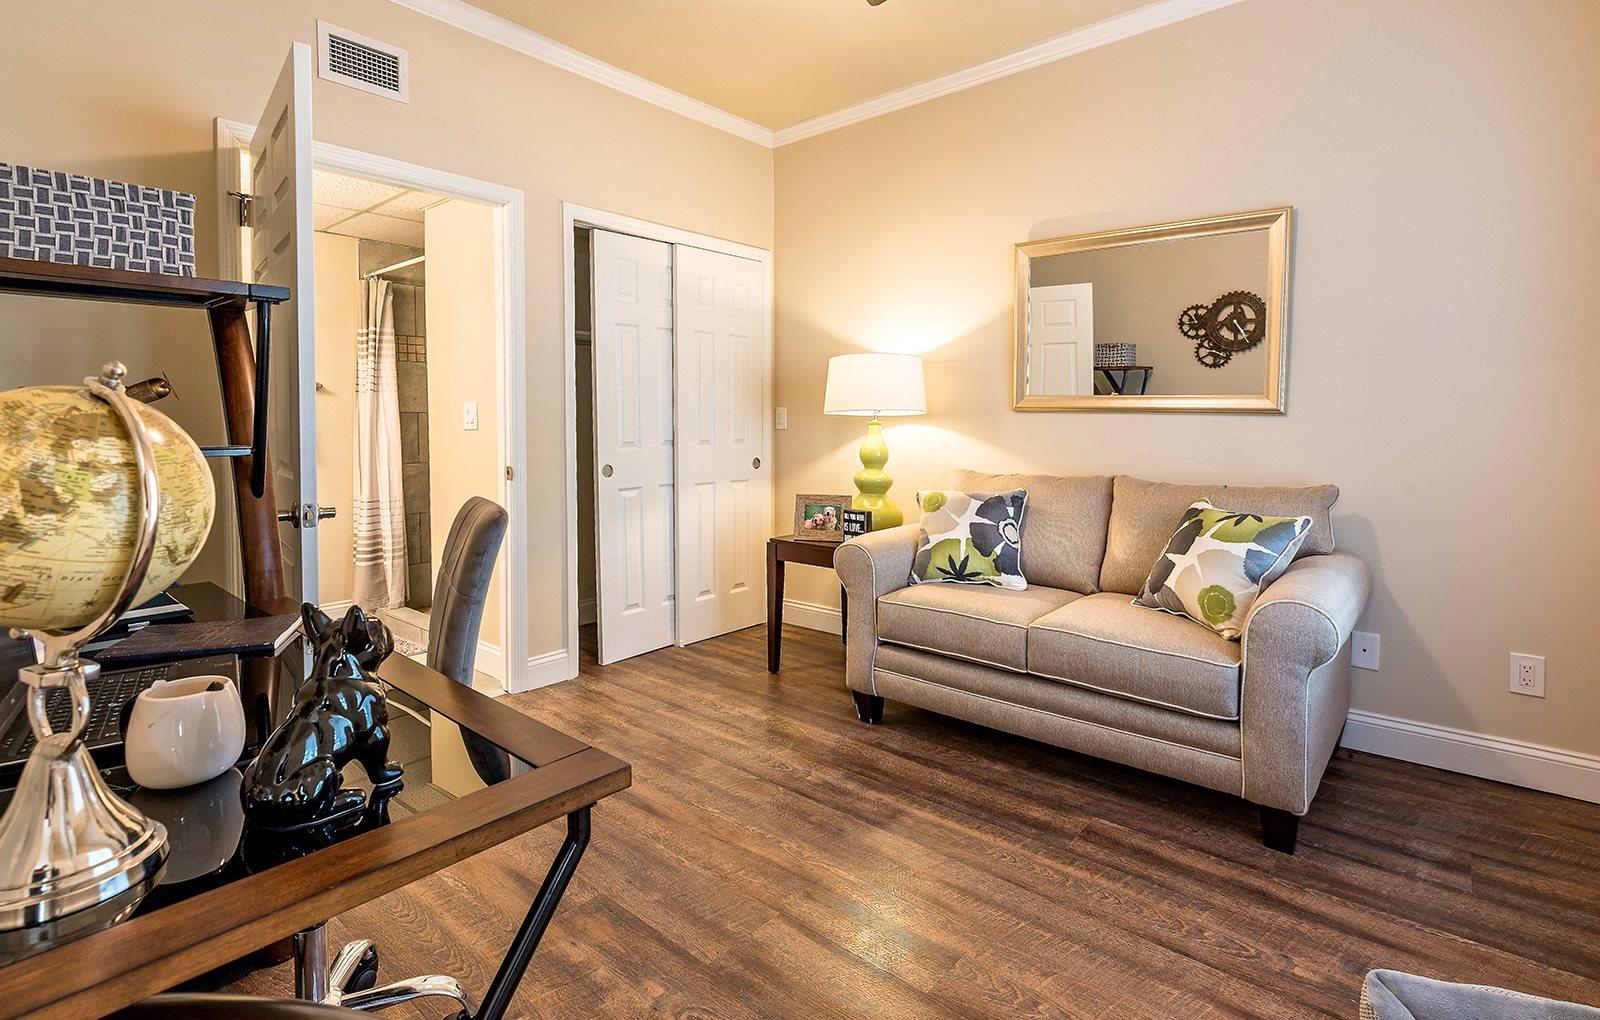 Strange Senior Living Apartments In Spartanburg Sc Pacifica Interior Design Ideas Jittwwsoteloinfo